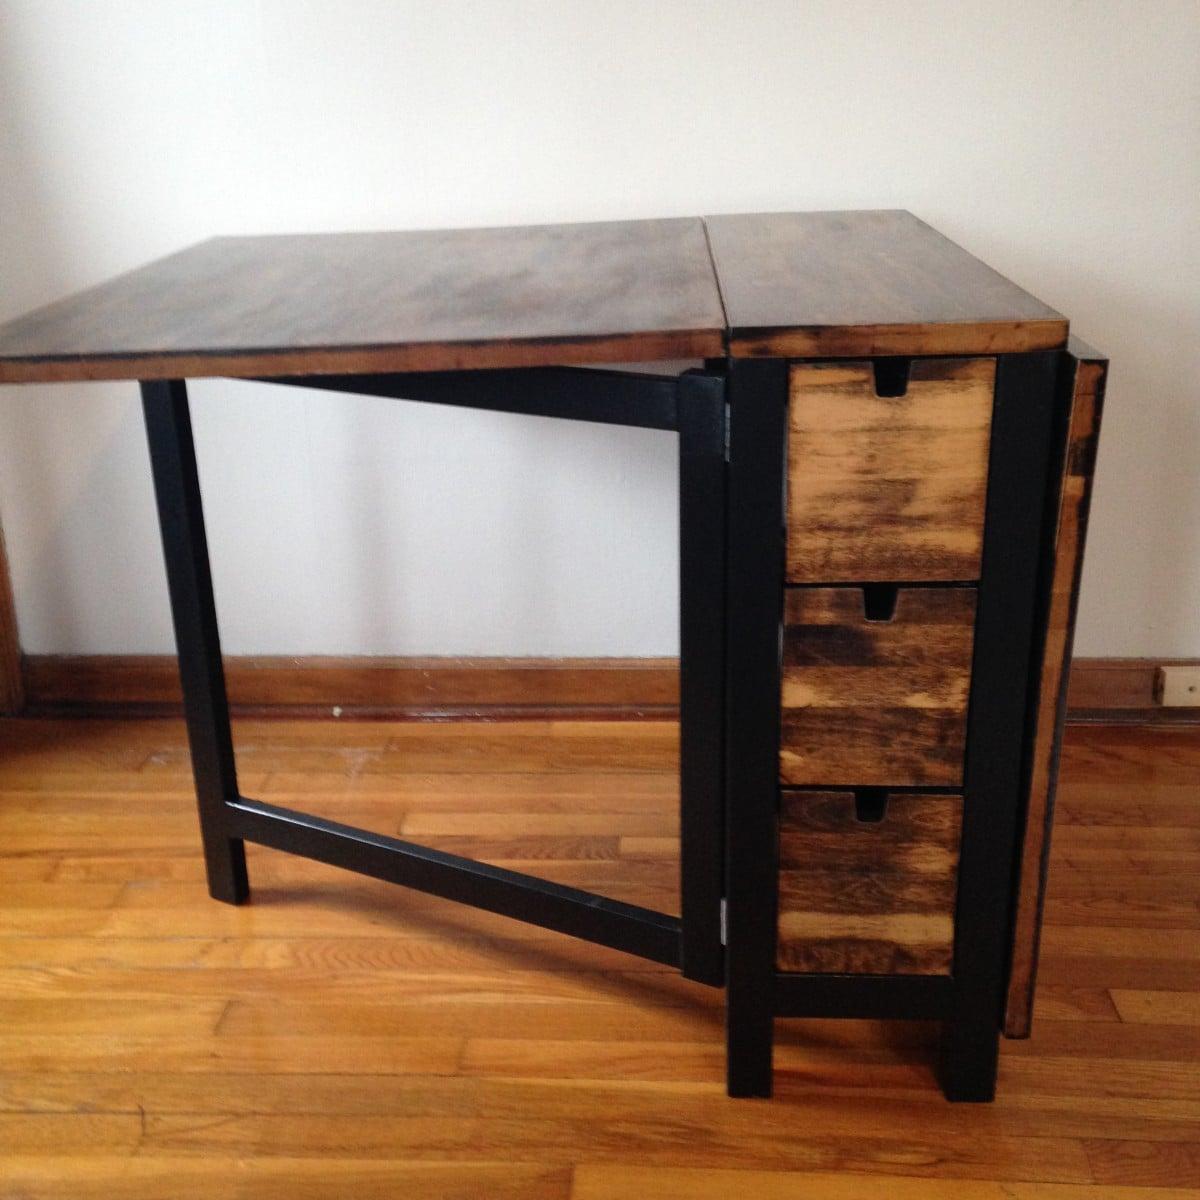 ikea norden gateleg table goes dark ikea hackers ikea. Black Bedroom Furniture Sets. Home Design Ideas